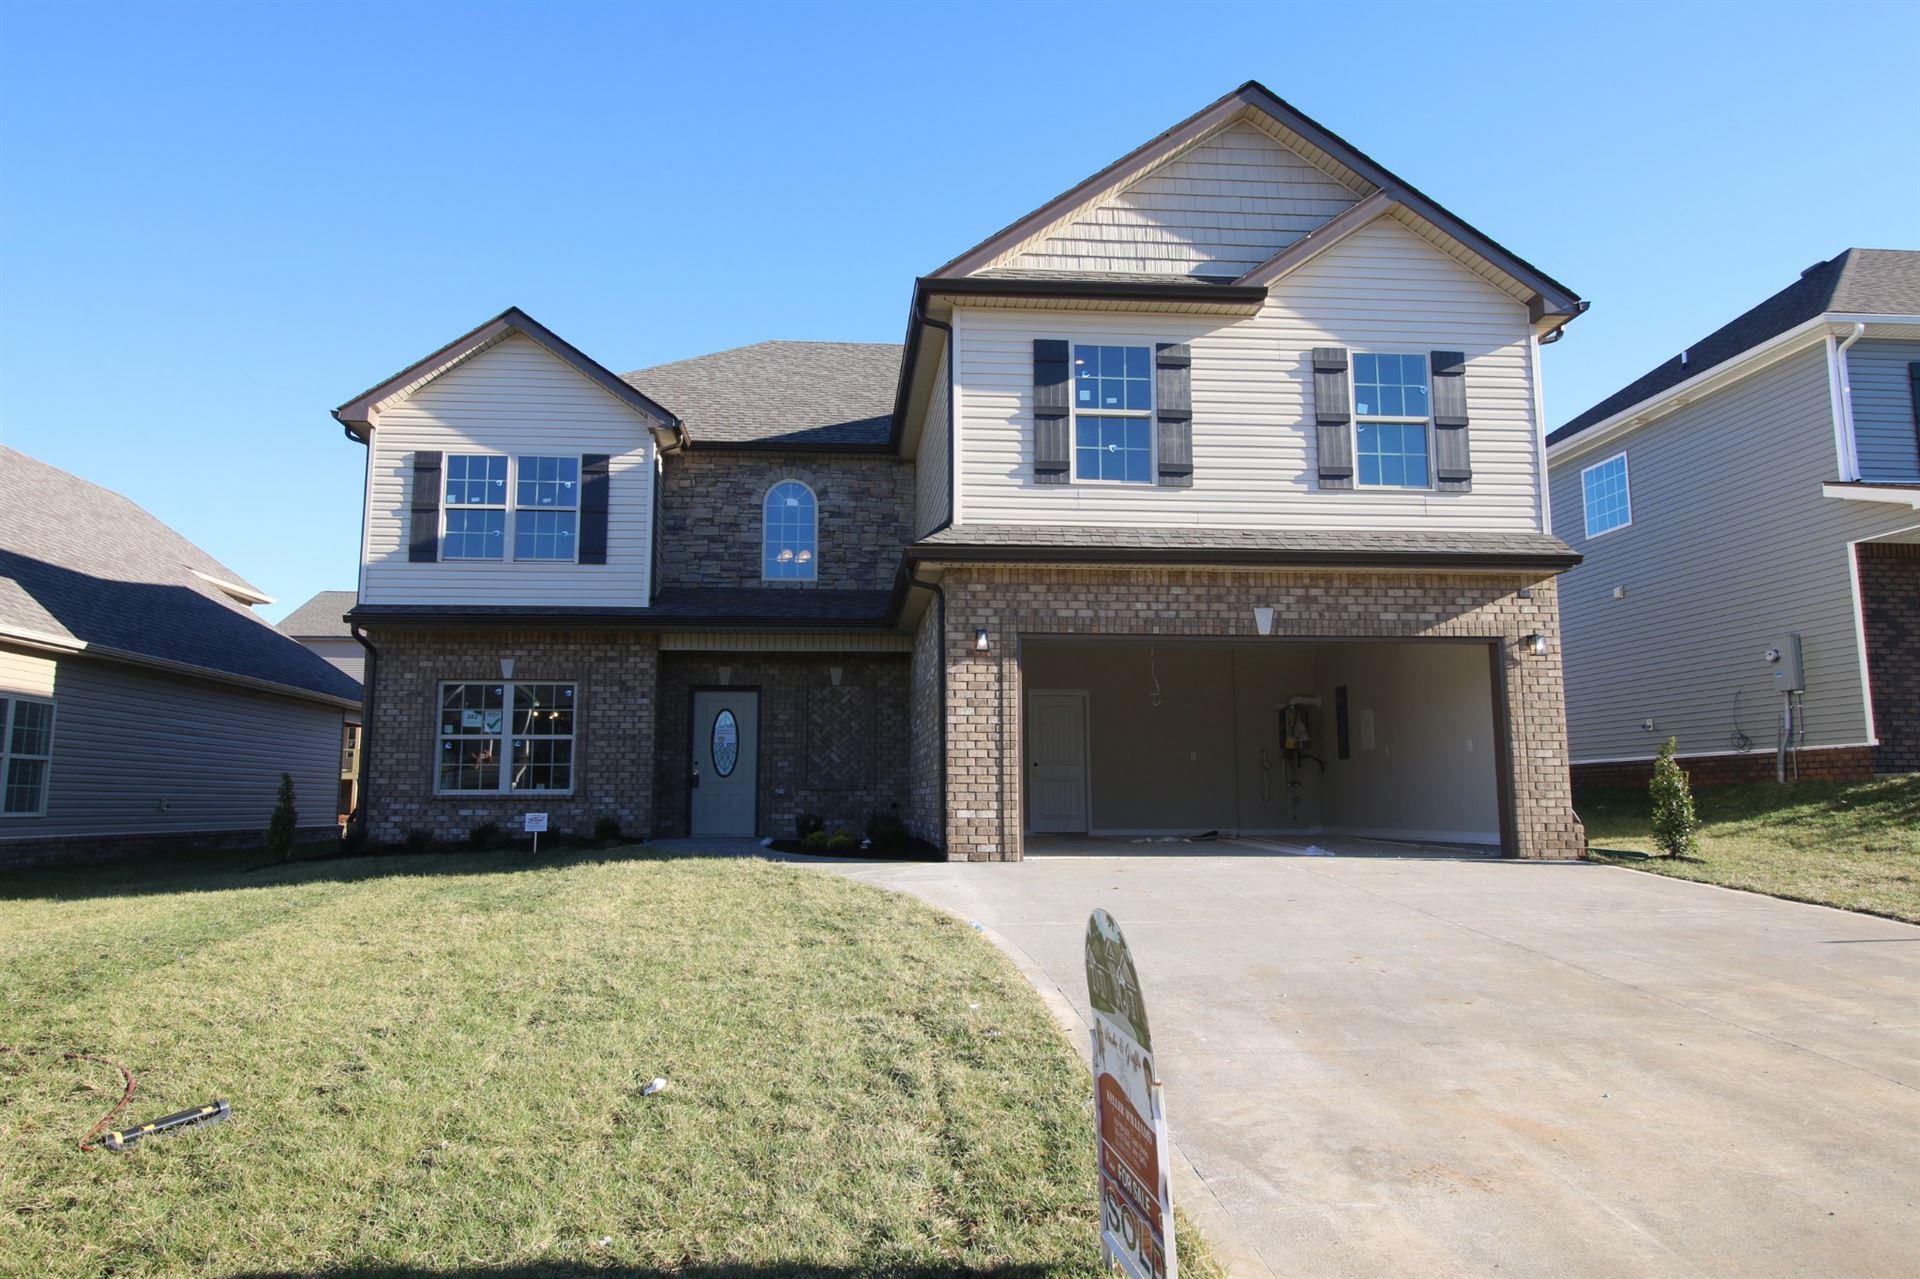 382 Summerfield, Clarksville, TN 37040 - MLS#: 2290704